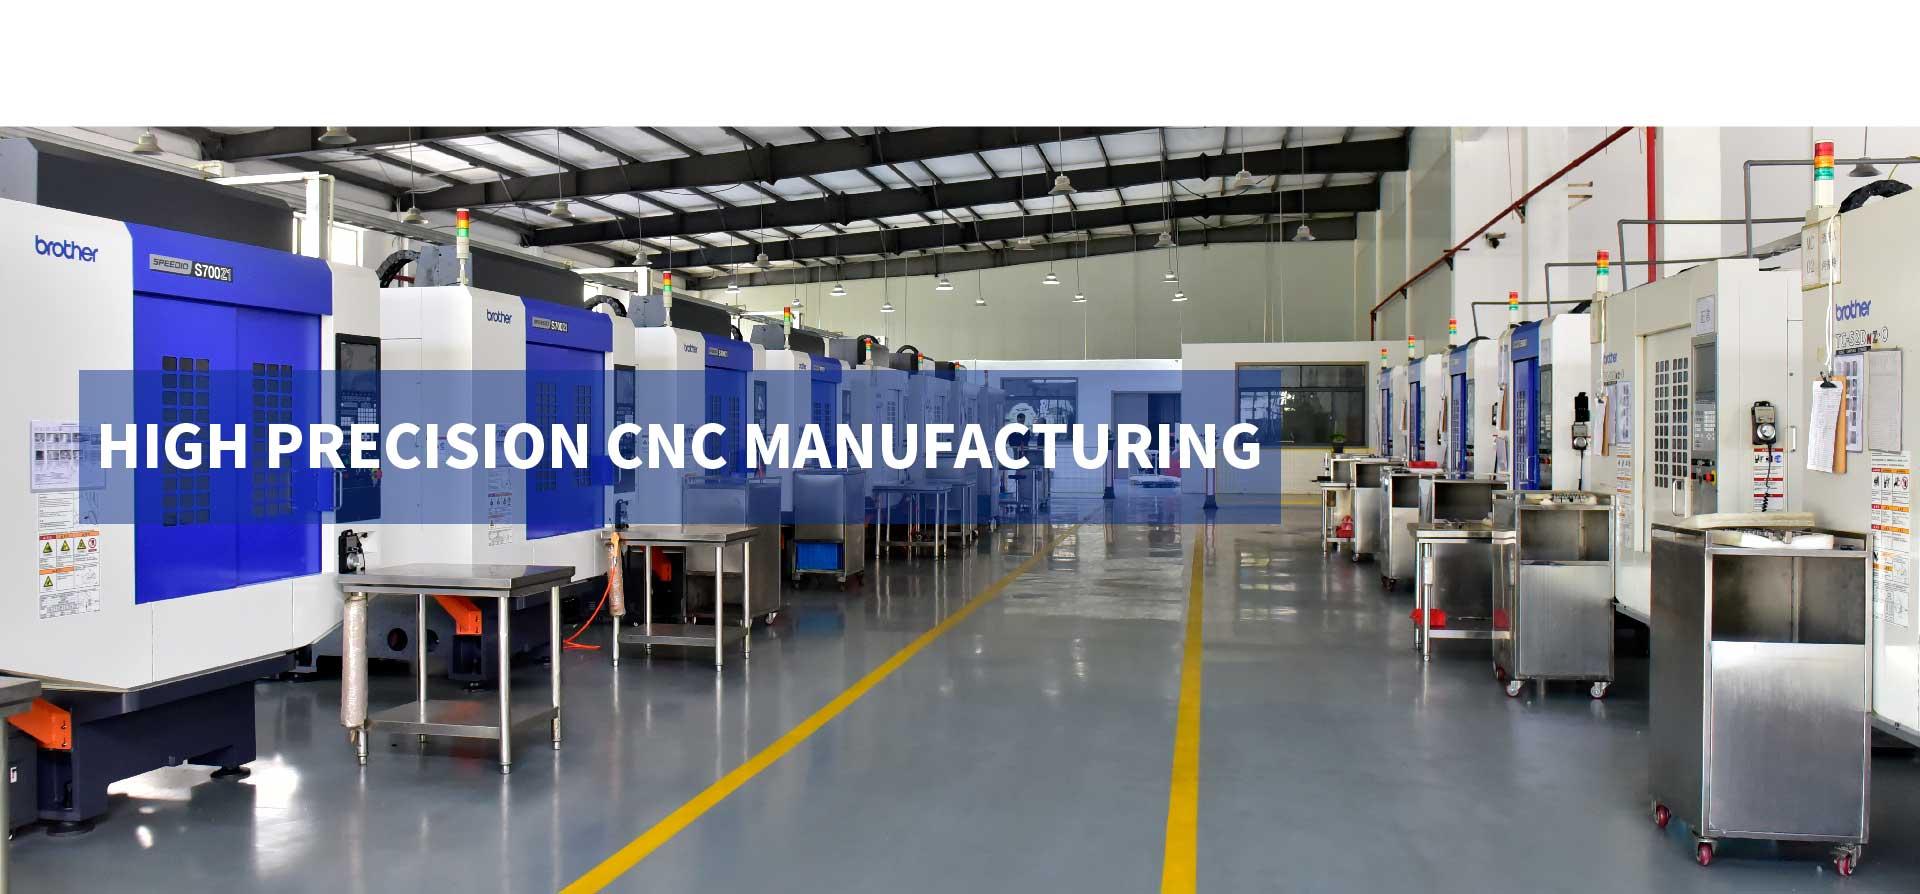 NC-milling-aluminum-service-banner